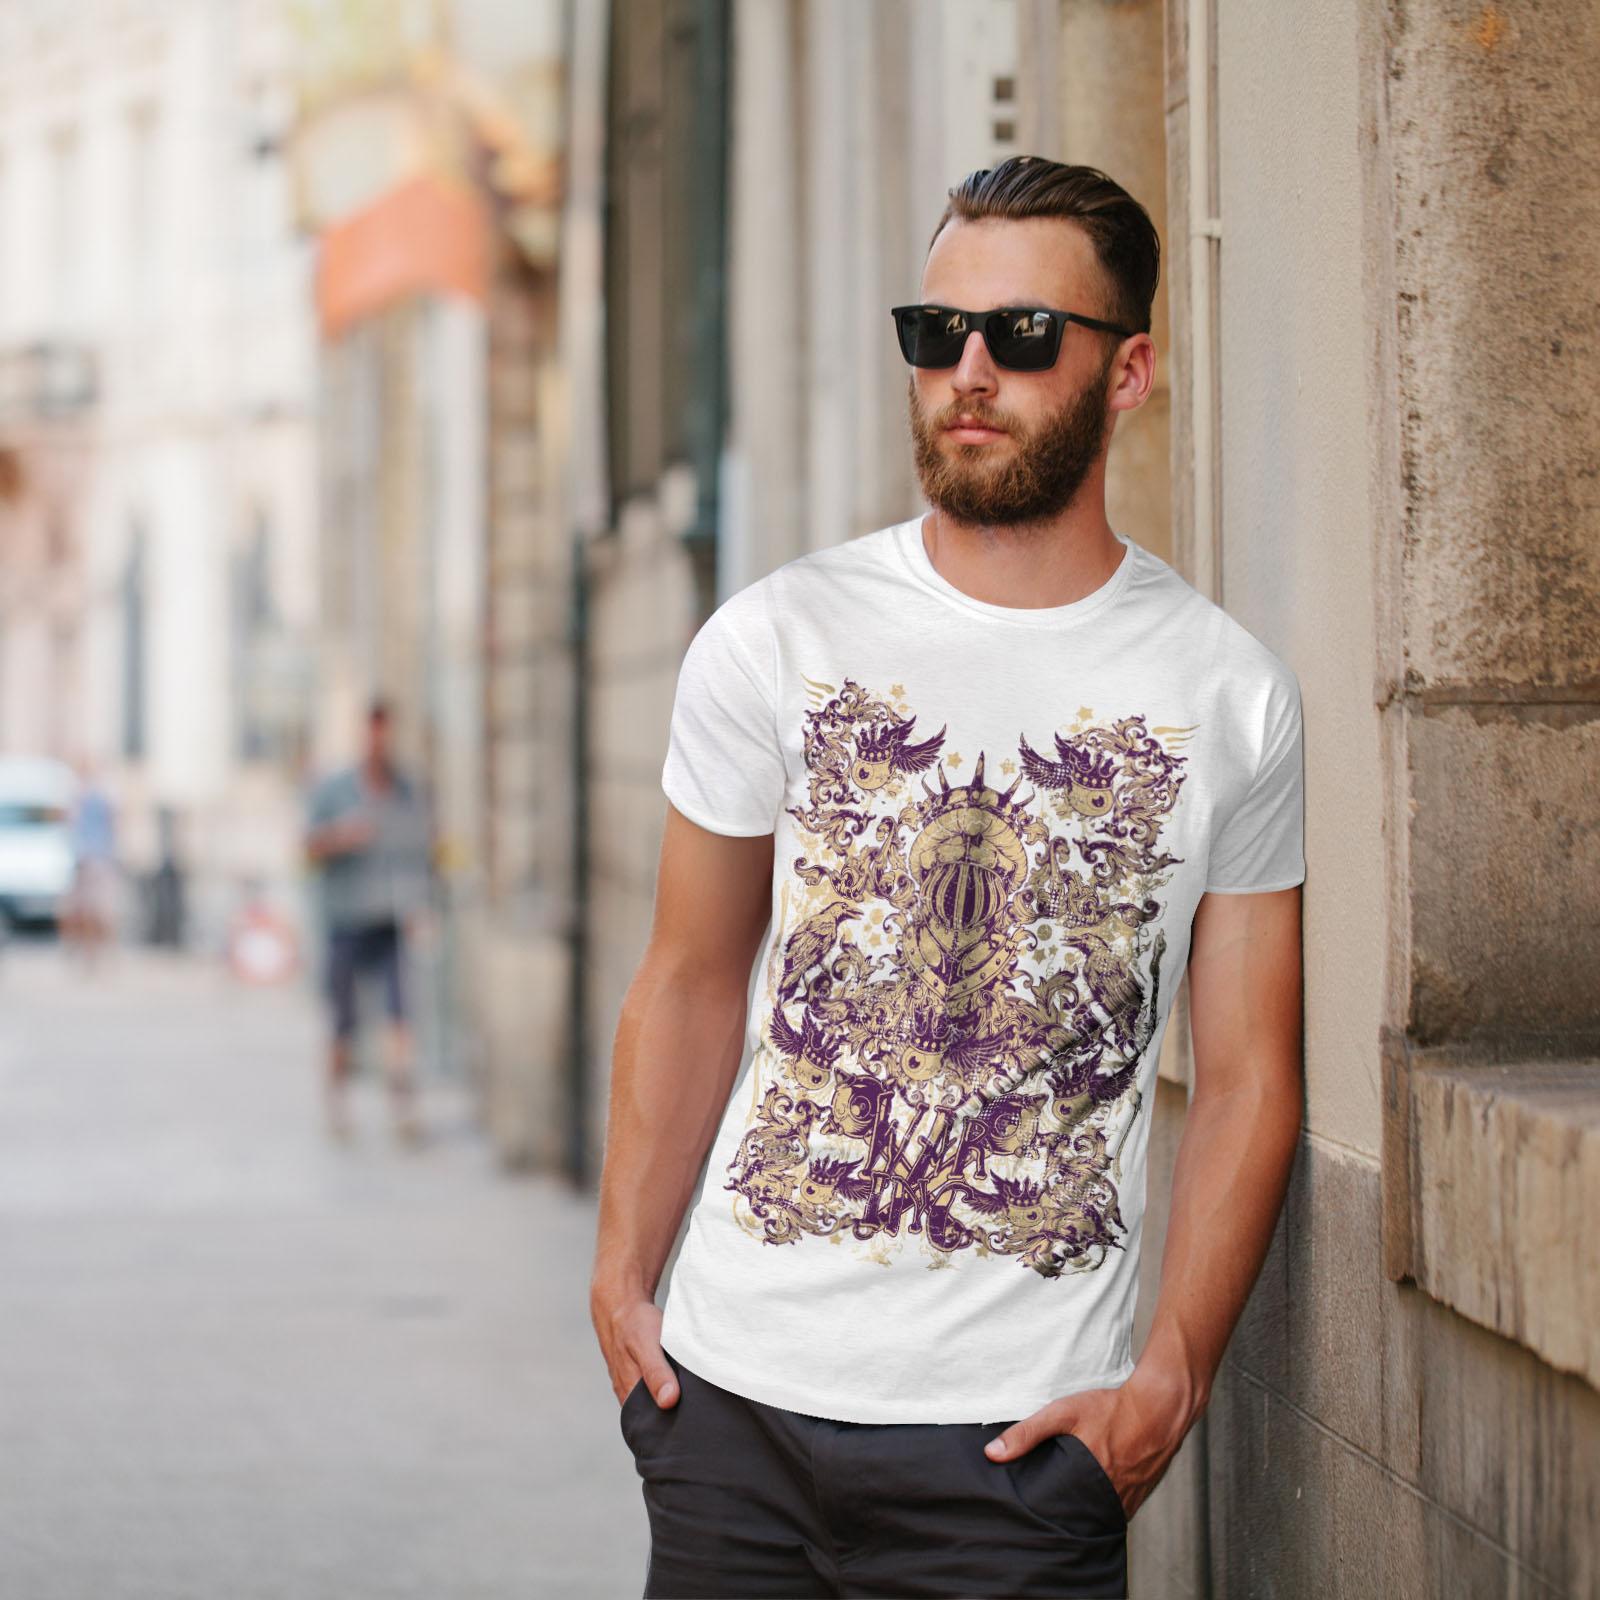 Wellcoda-War-Inc-Zombie-Mens-T-shirt-Monster-Graphic-Design-Printed-Tee thumbnail 11